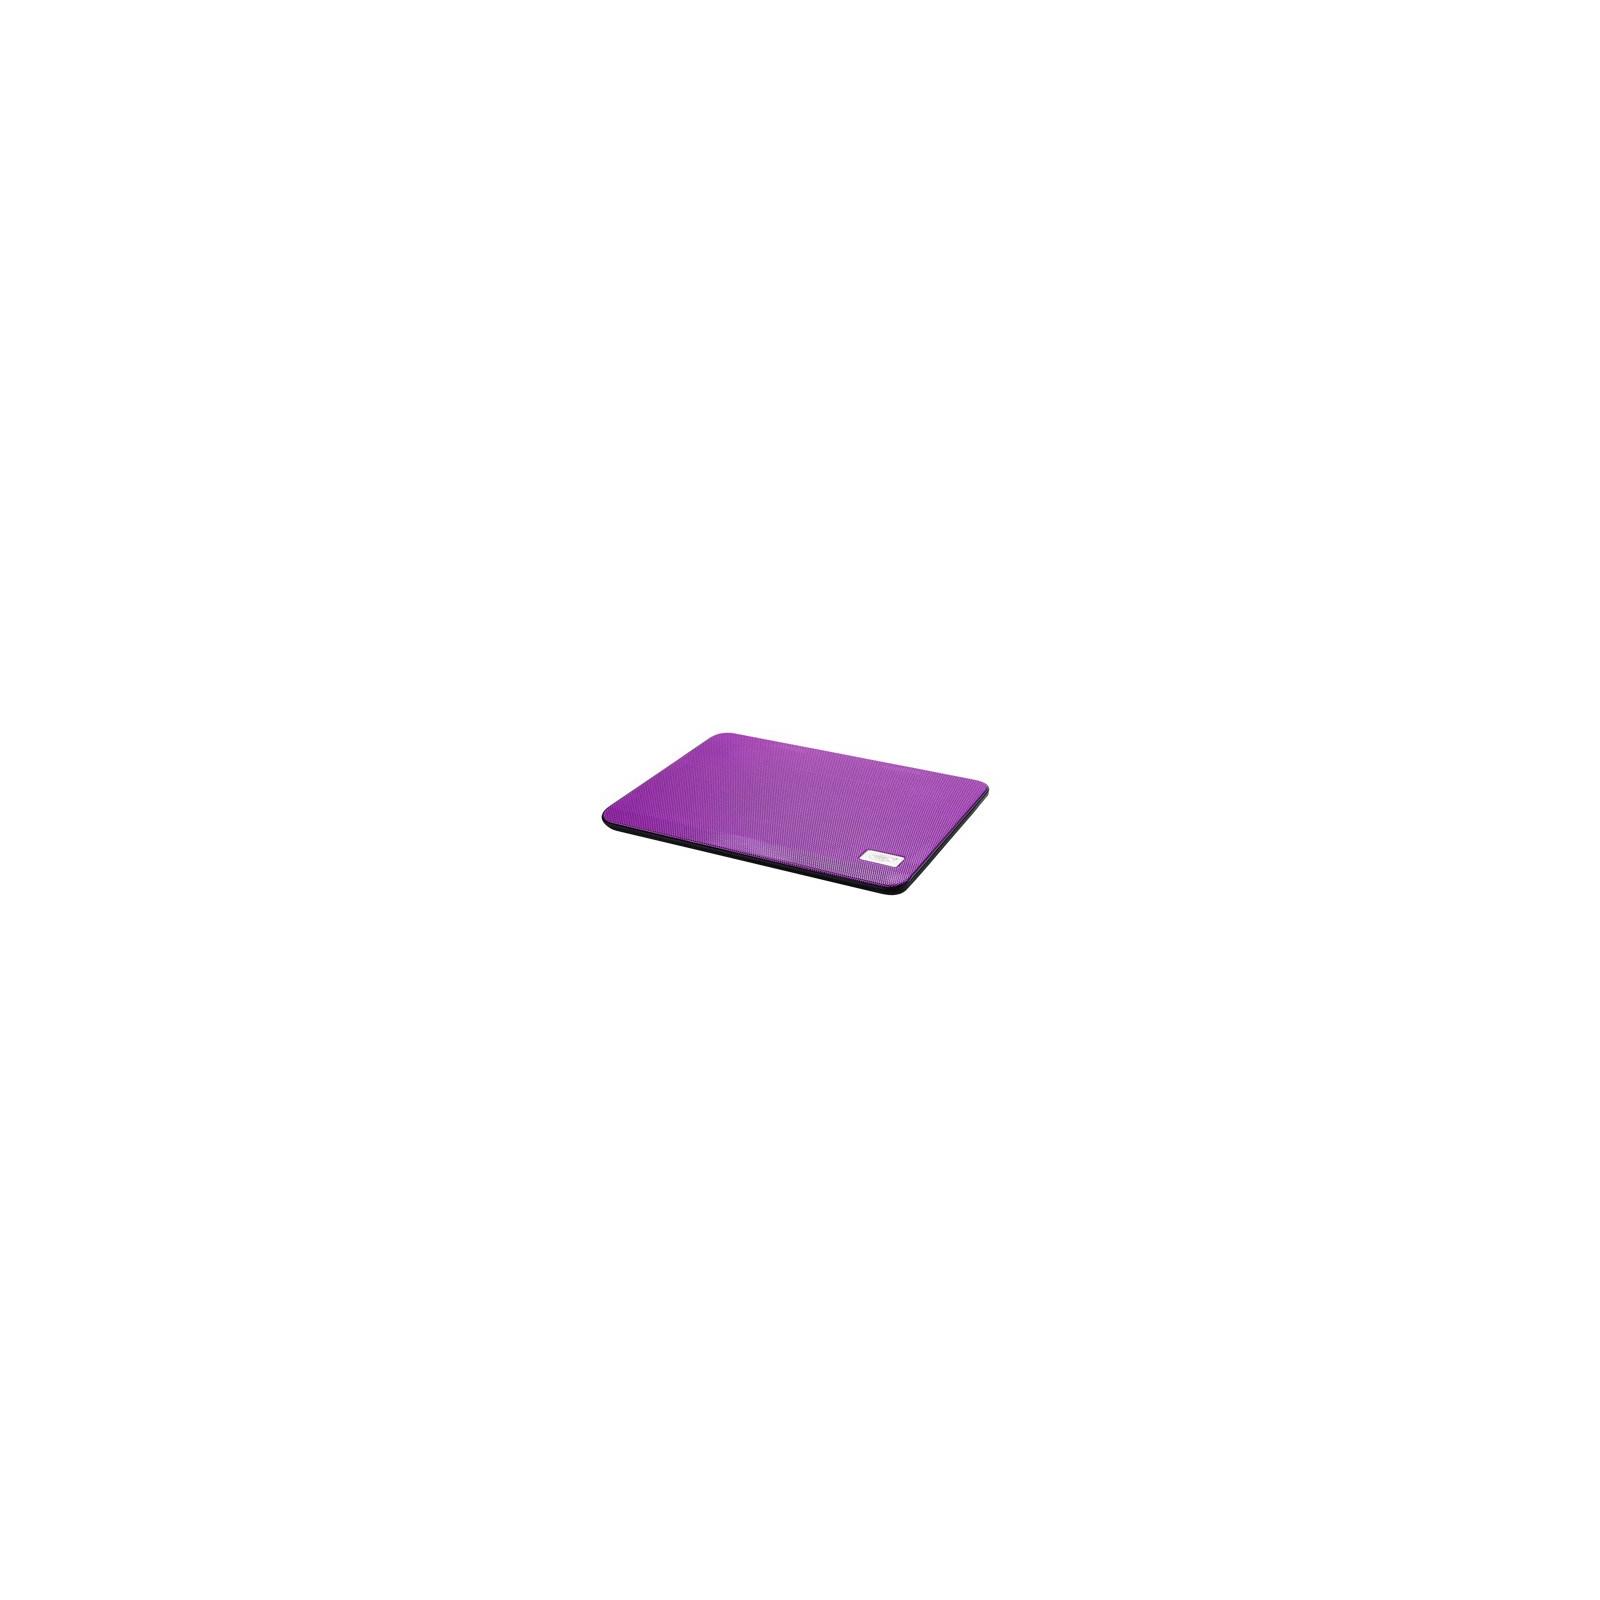 Подставка для ноутбука Deepcool N17 VT Purple (N17 Purple)